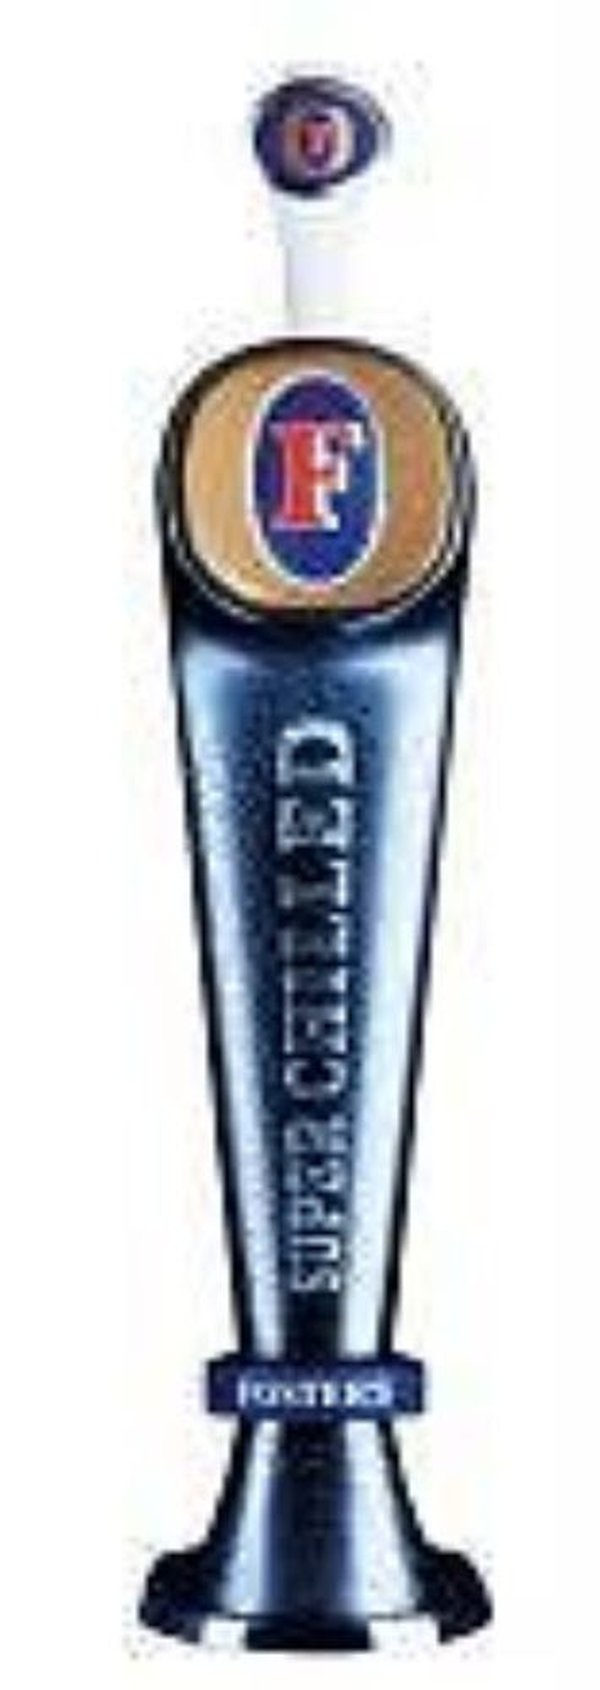 Fosters beer tap